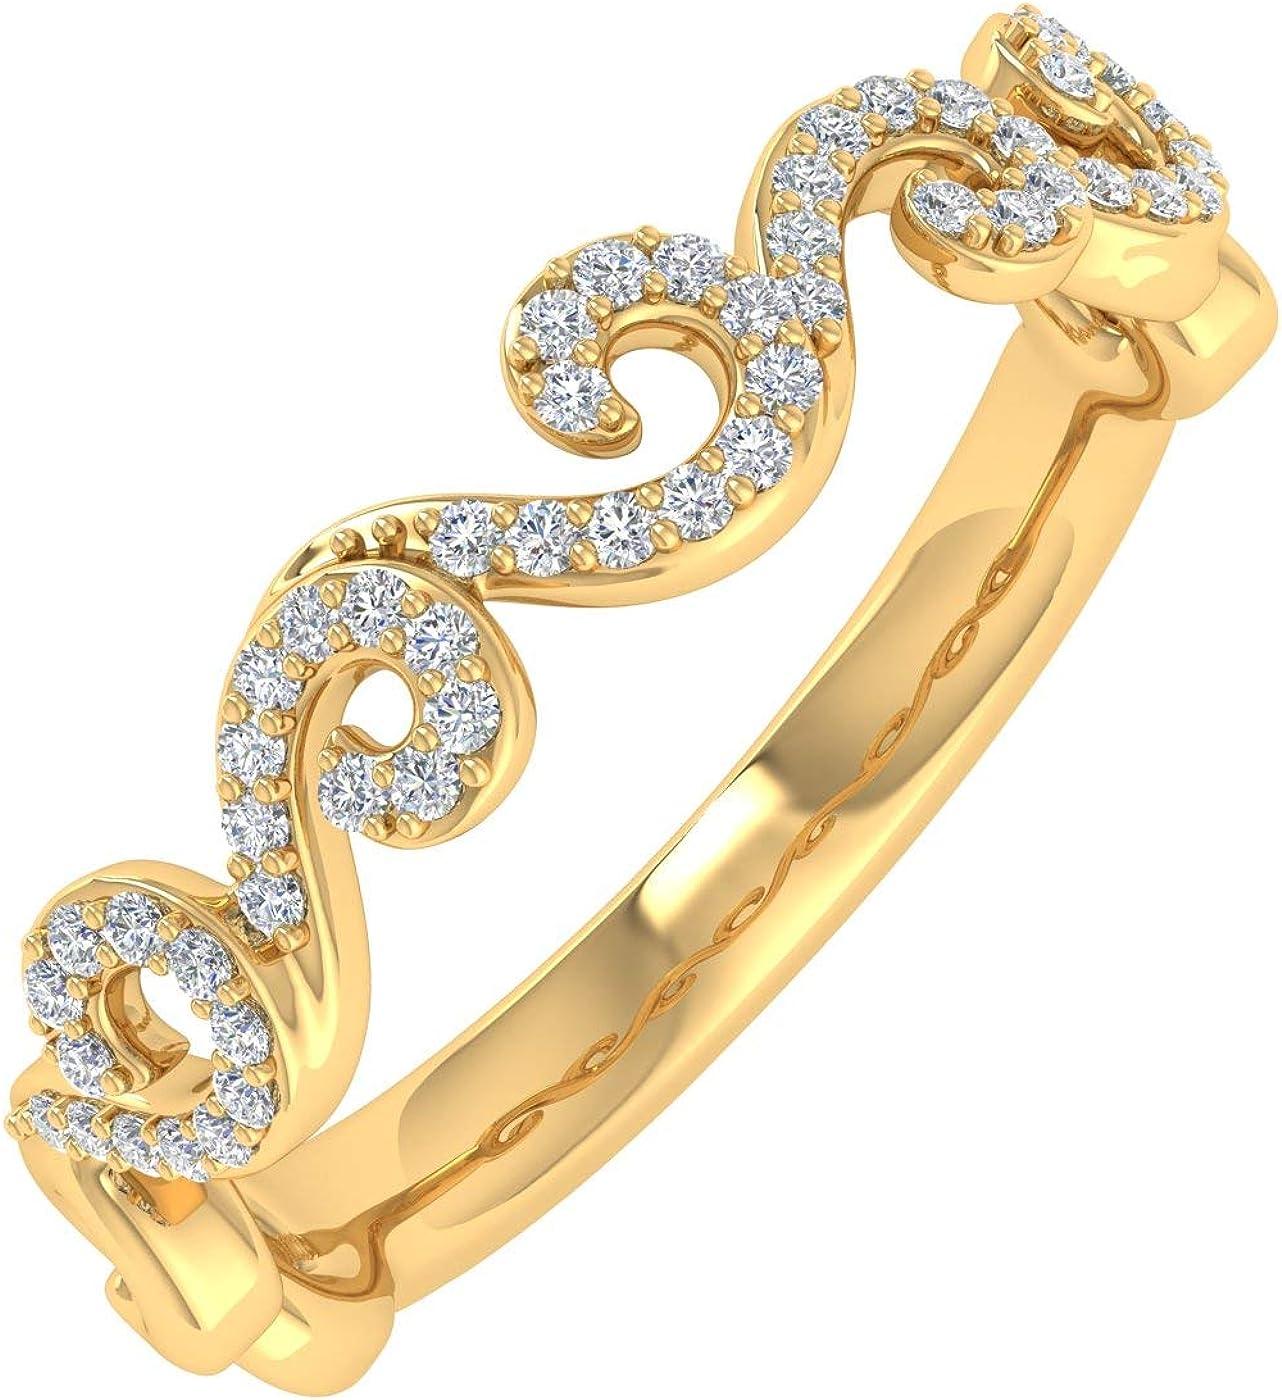 Superlatite 0.15 Carat Diamond Philadelphia Mall Wave Shaped Wedding Band 10K Gold in Ring